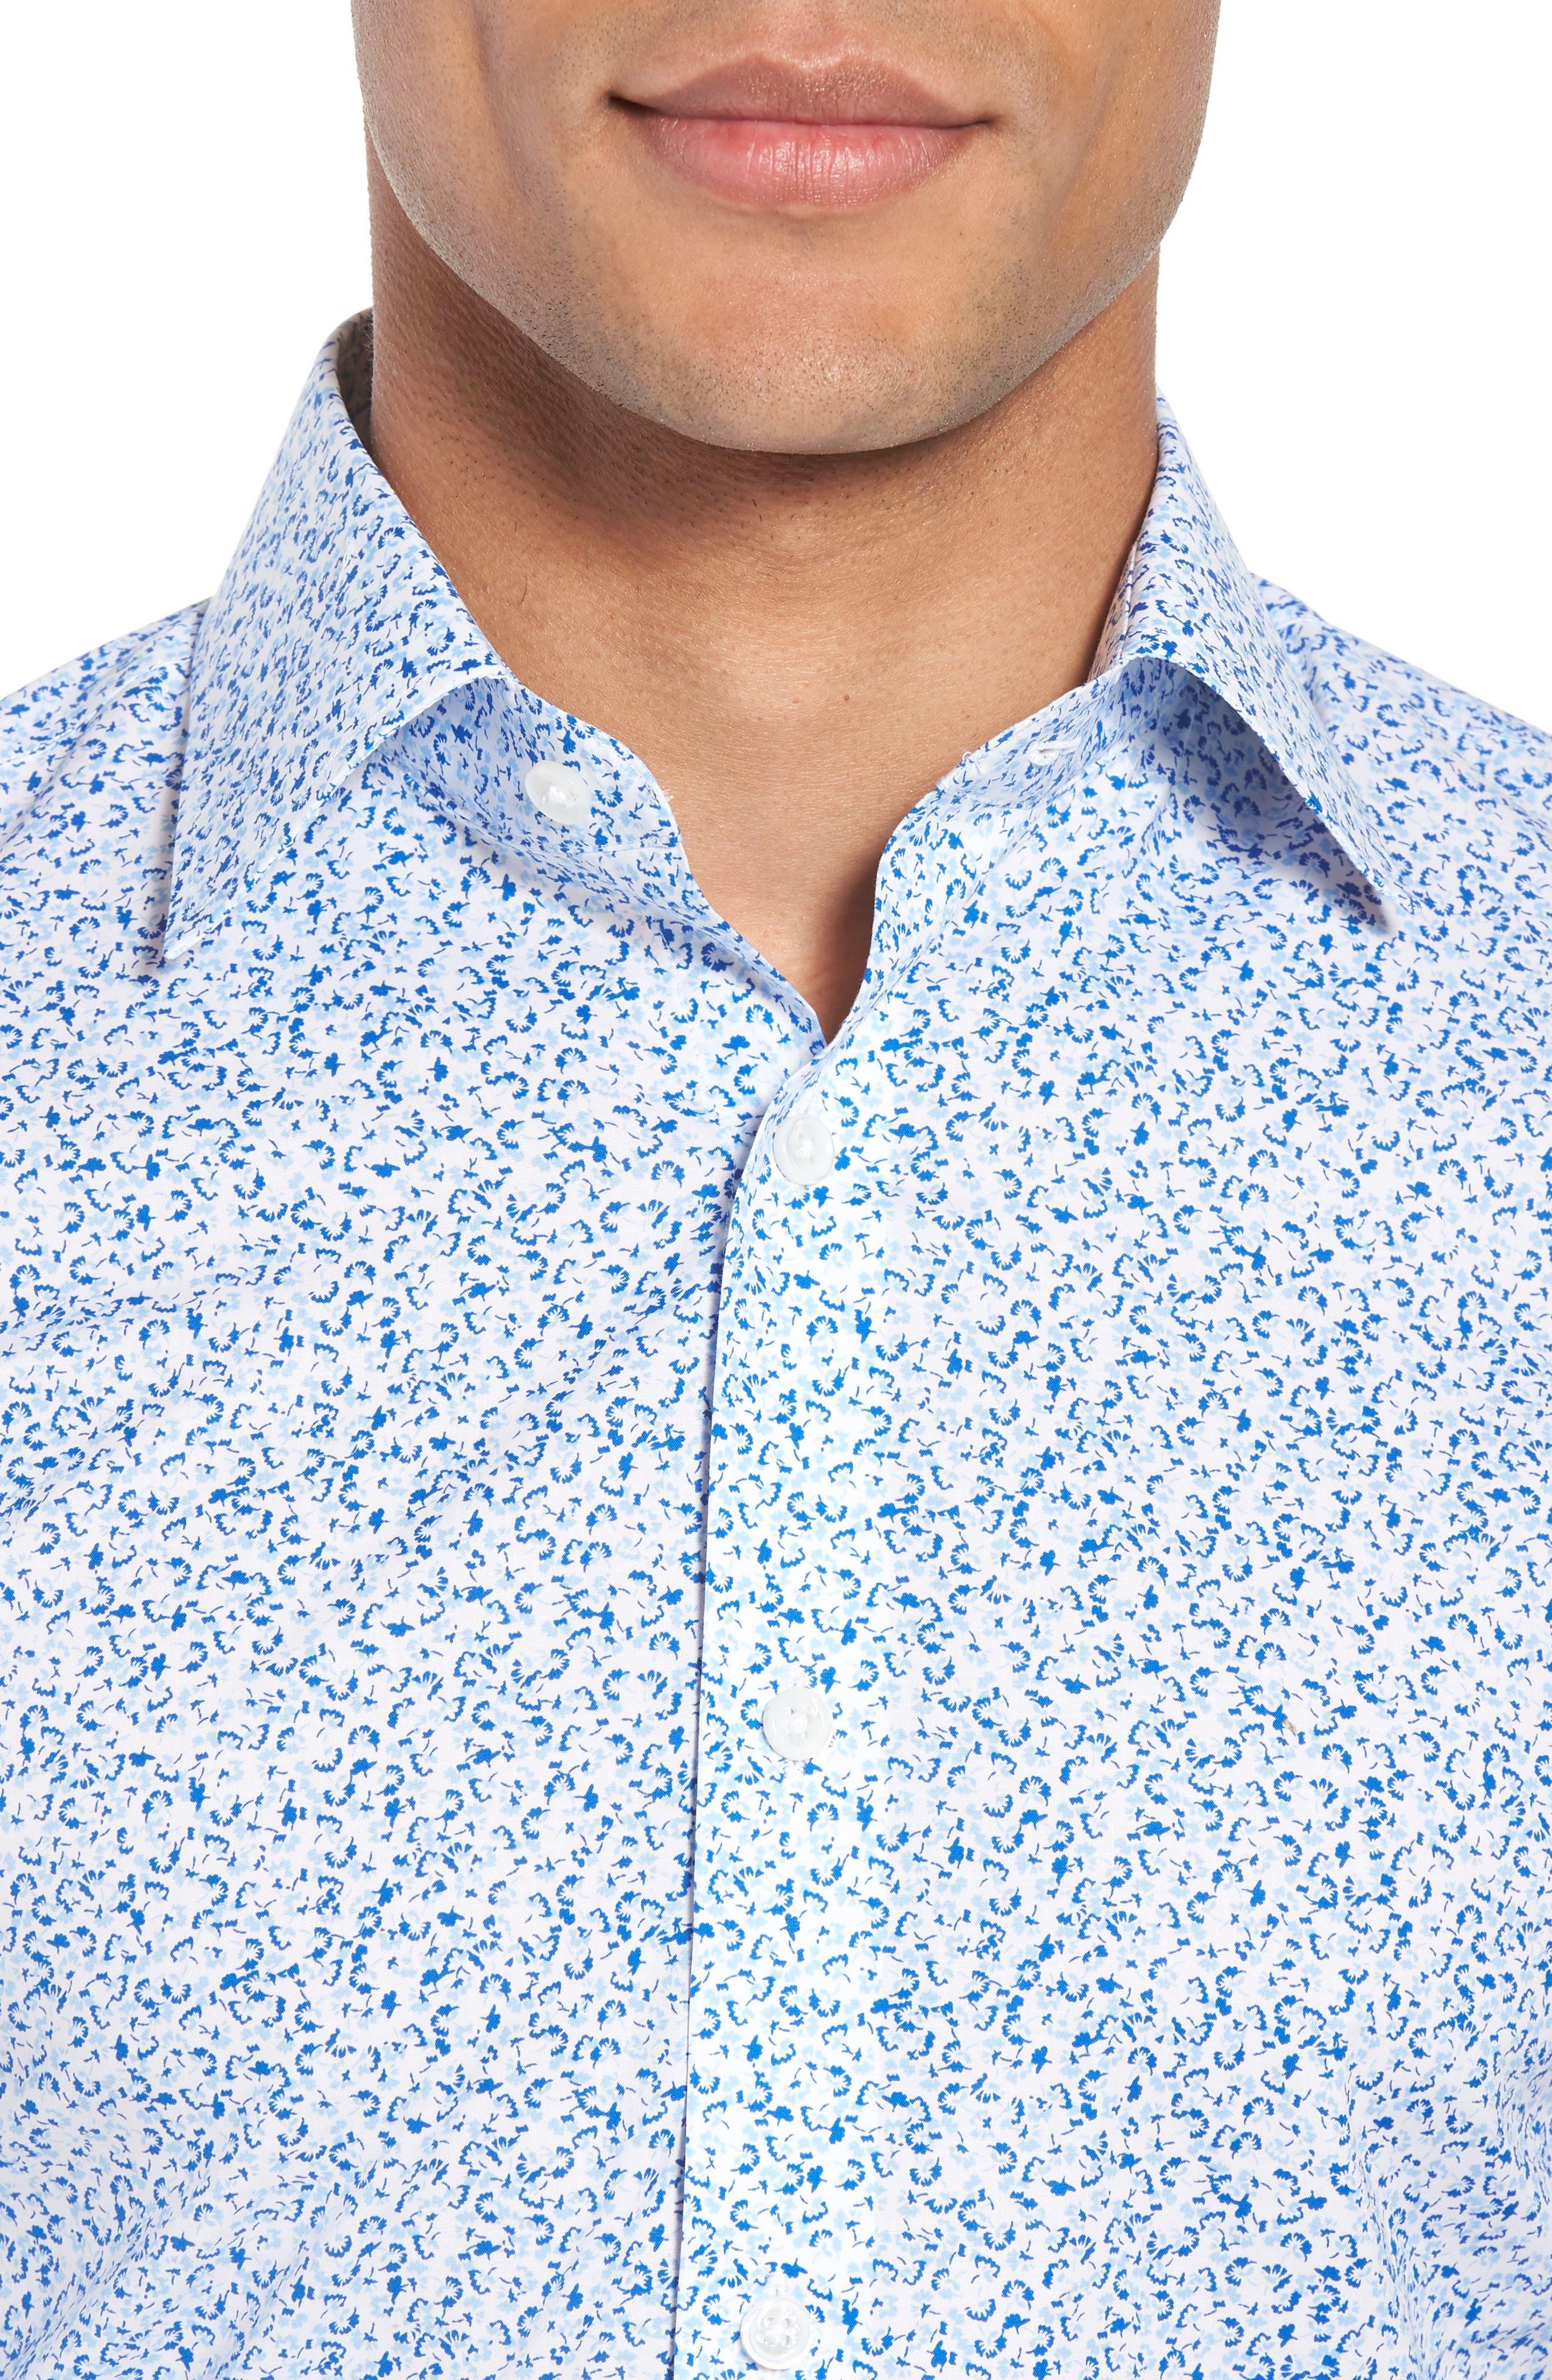 Jetsetter Slim Fit Floral Dress Shirt,                             Alternate thumbnail 2, color,                             Lapis Blue